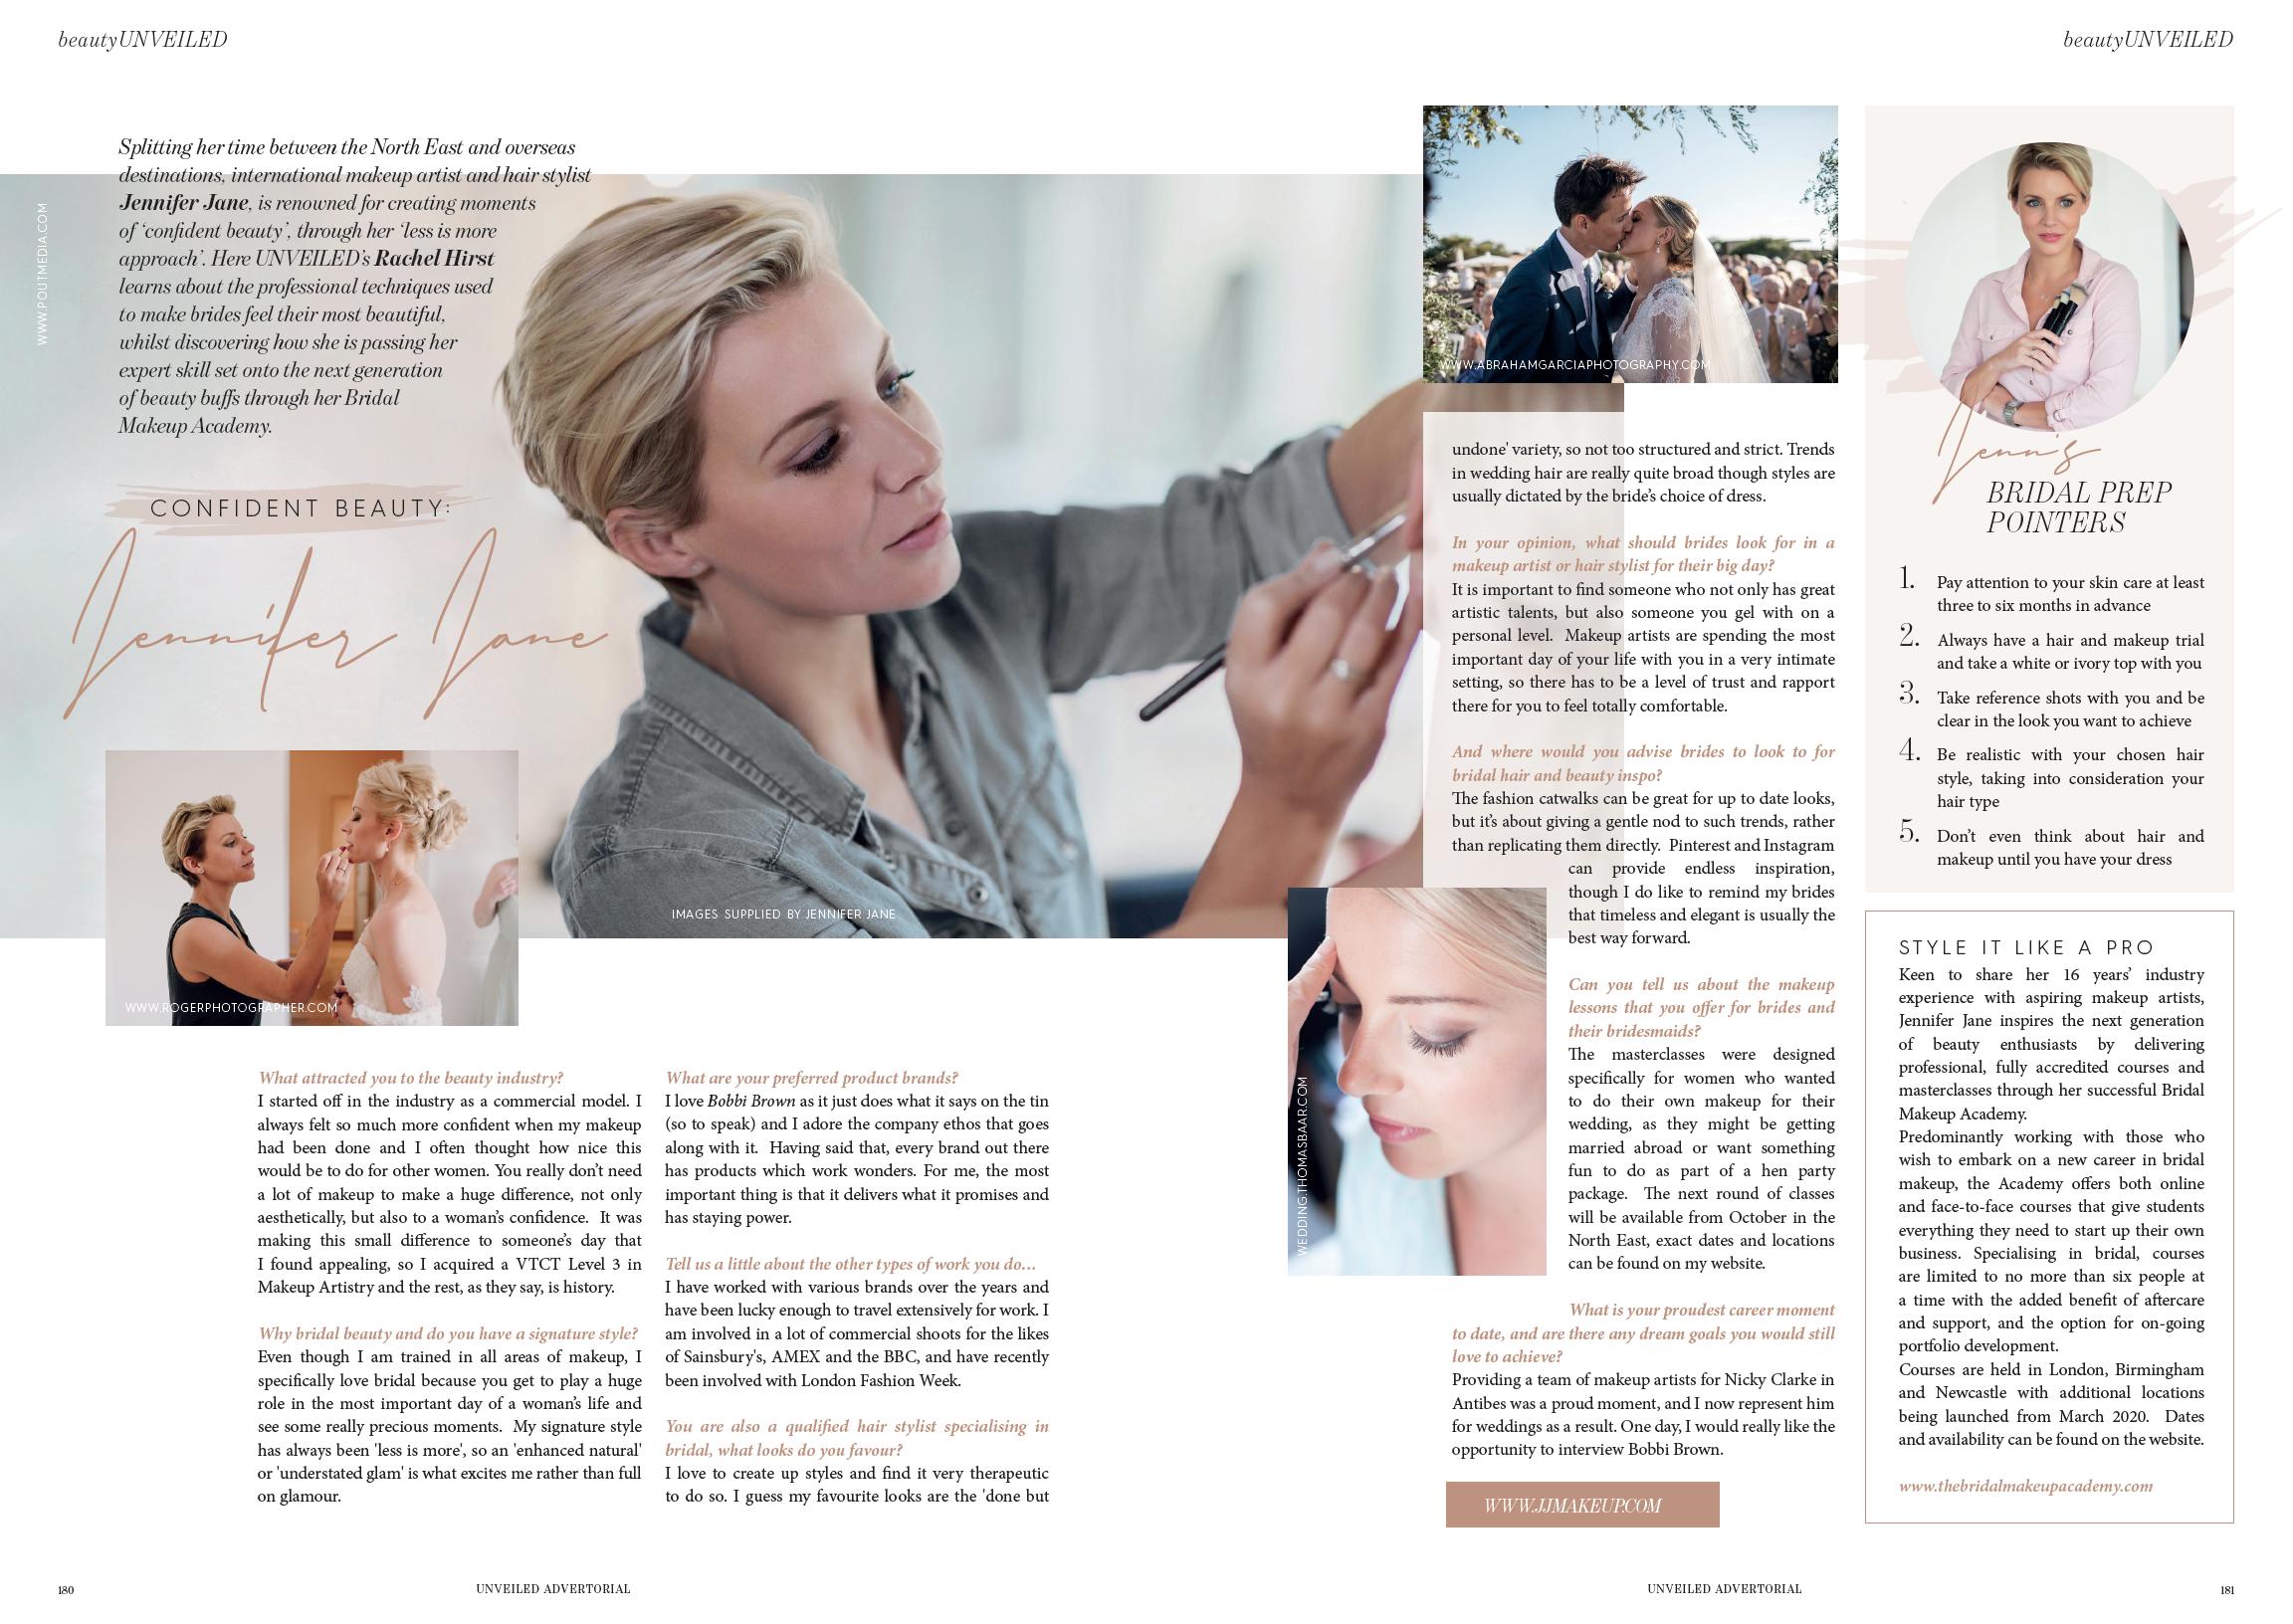 Unveiled Magazine interview with Makeup Artist Jennifer Jane